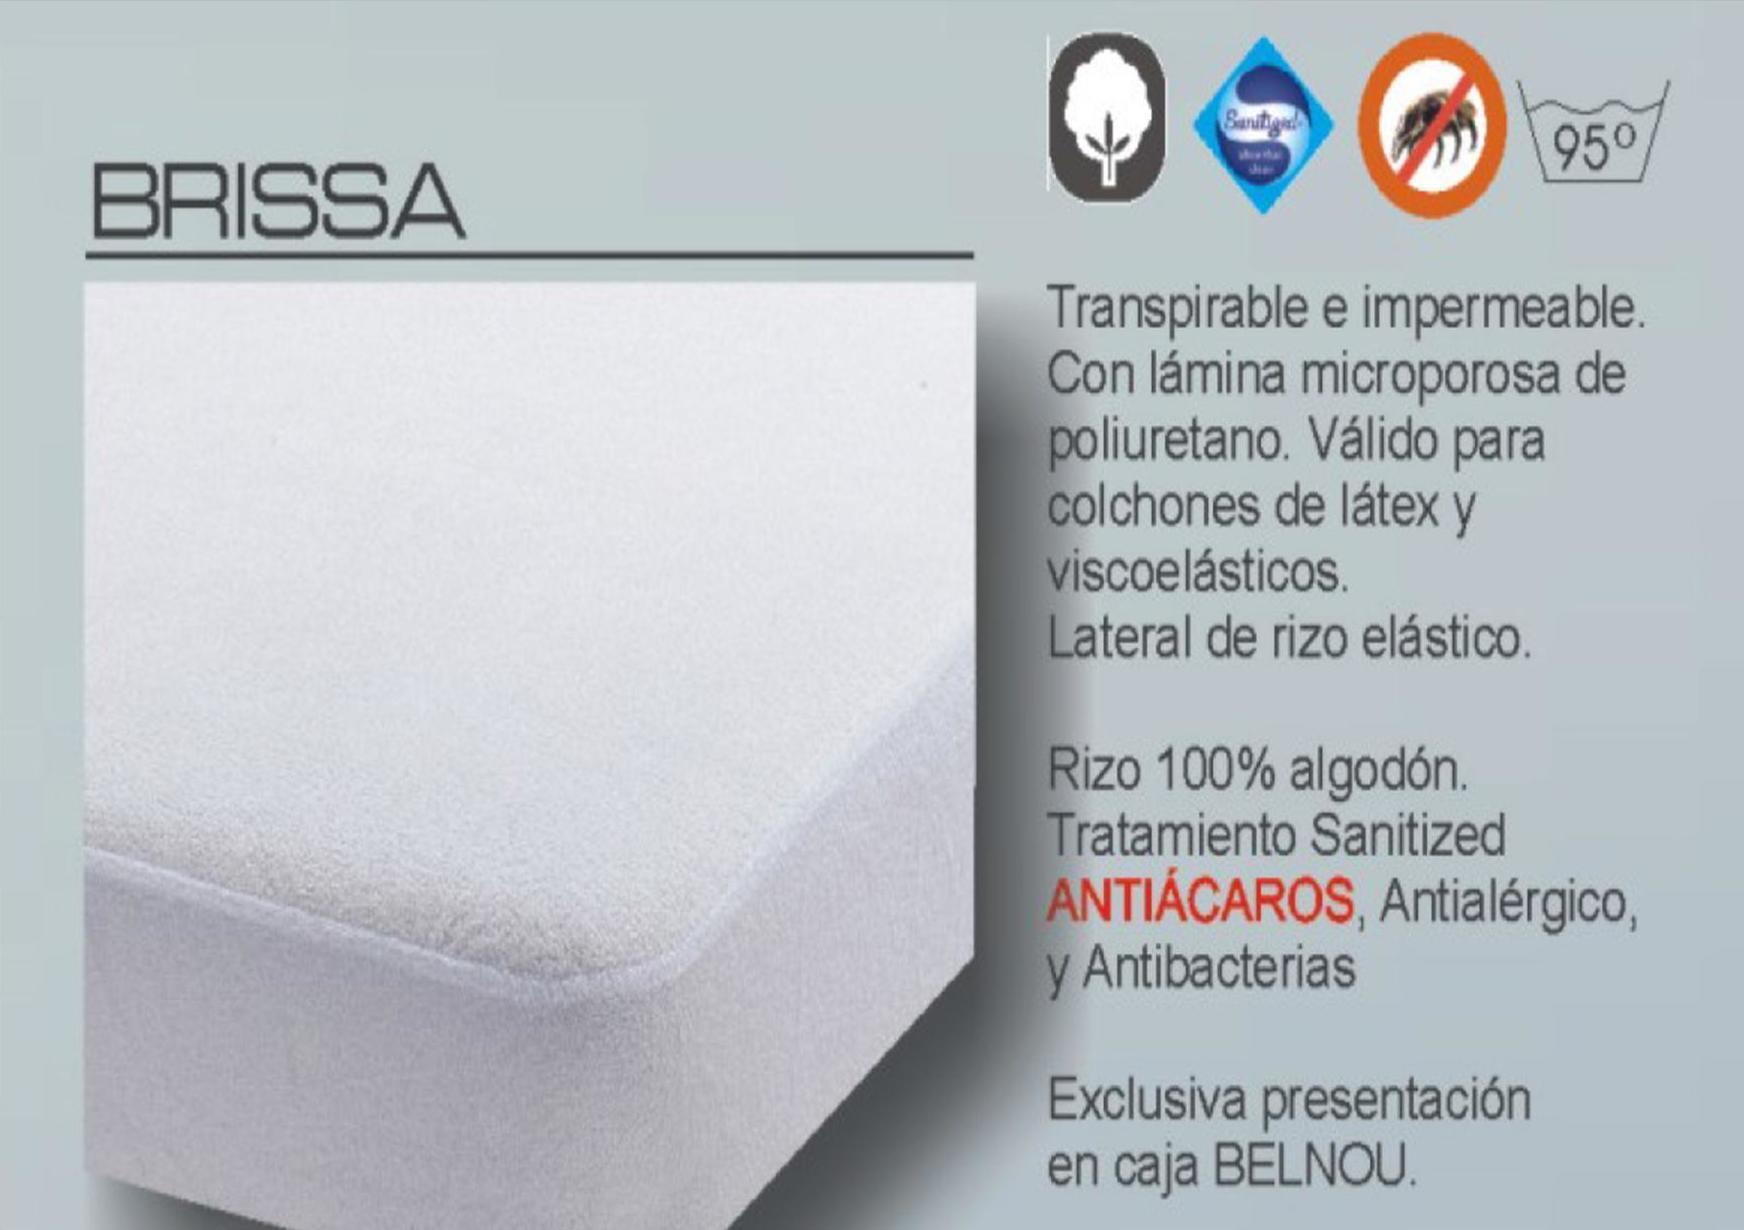 Protector de colchón BRISSA